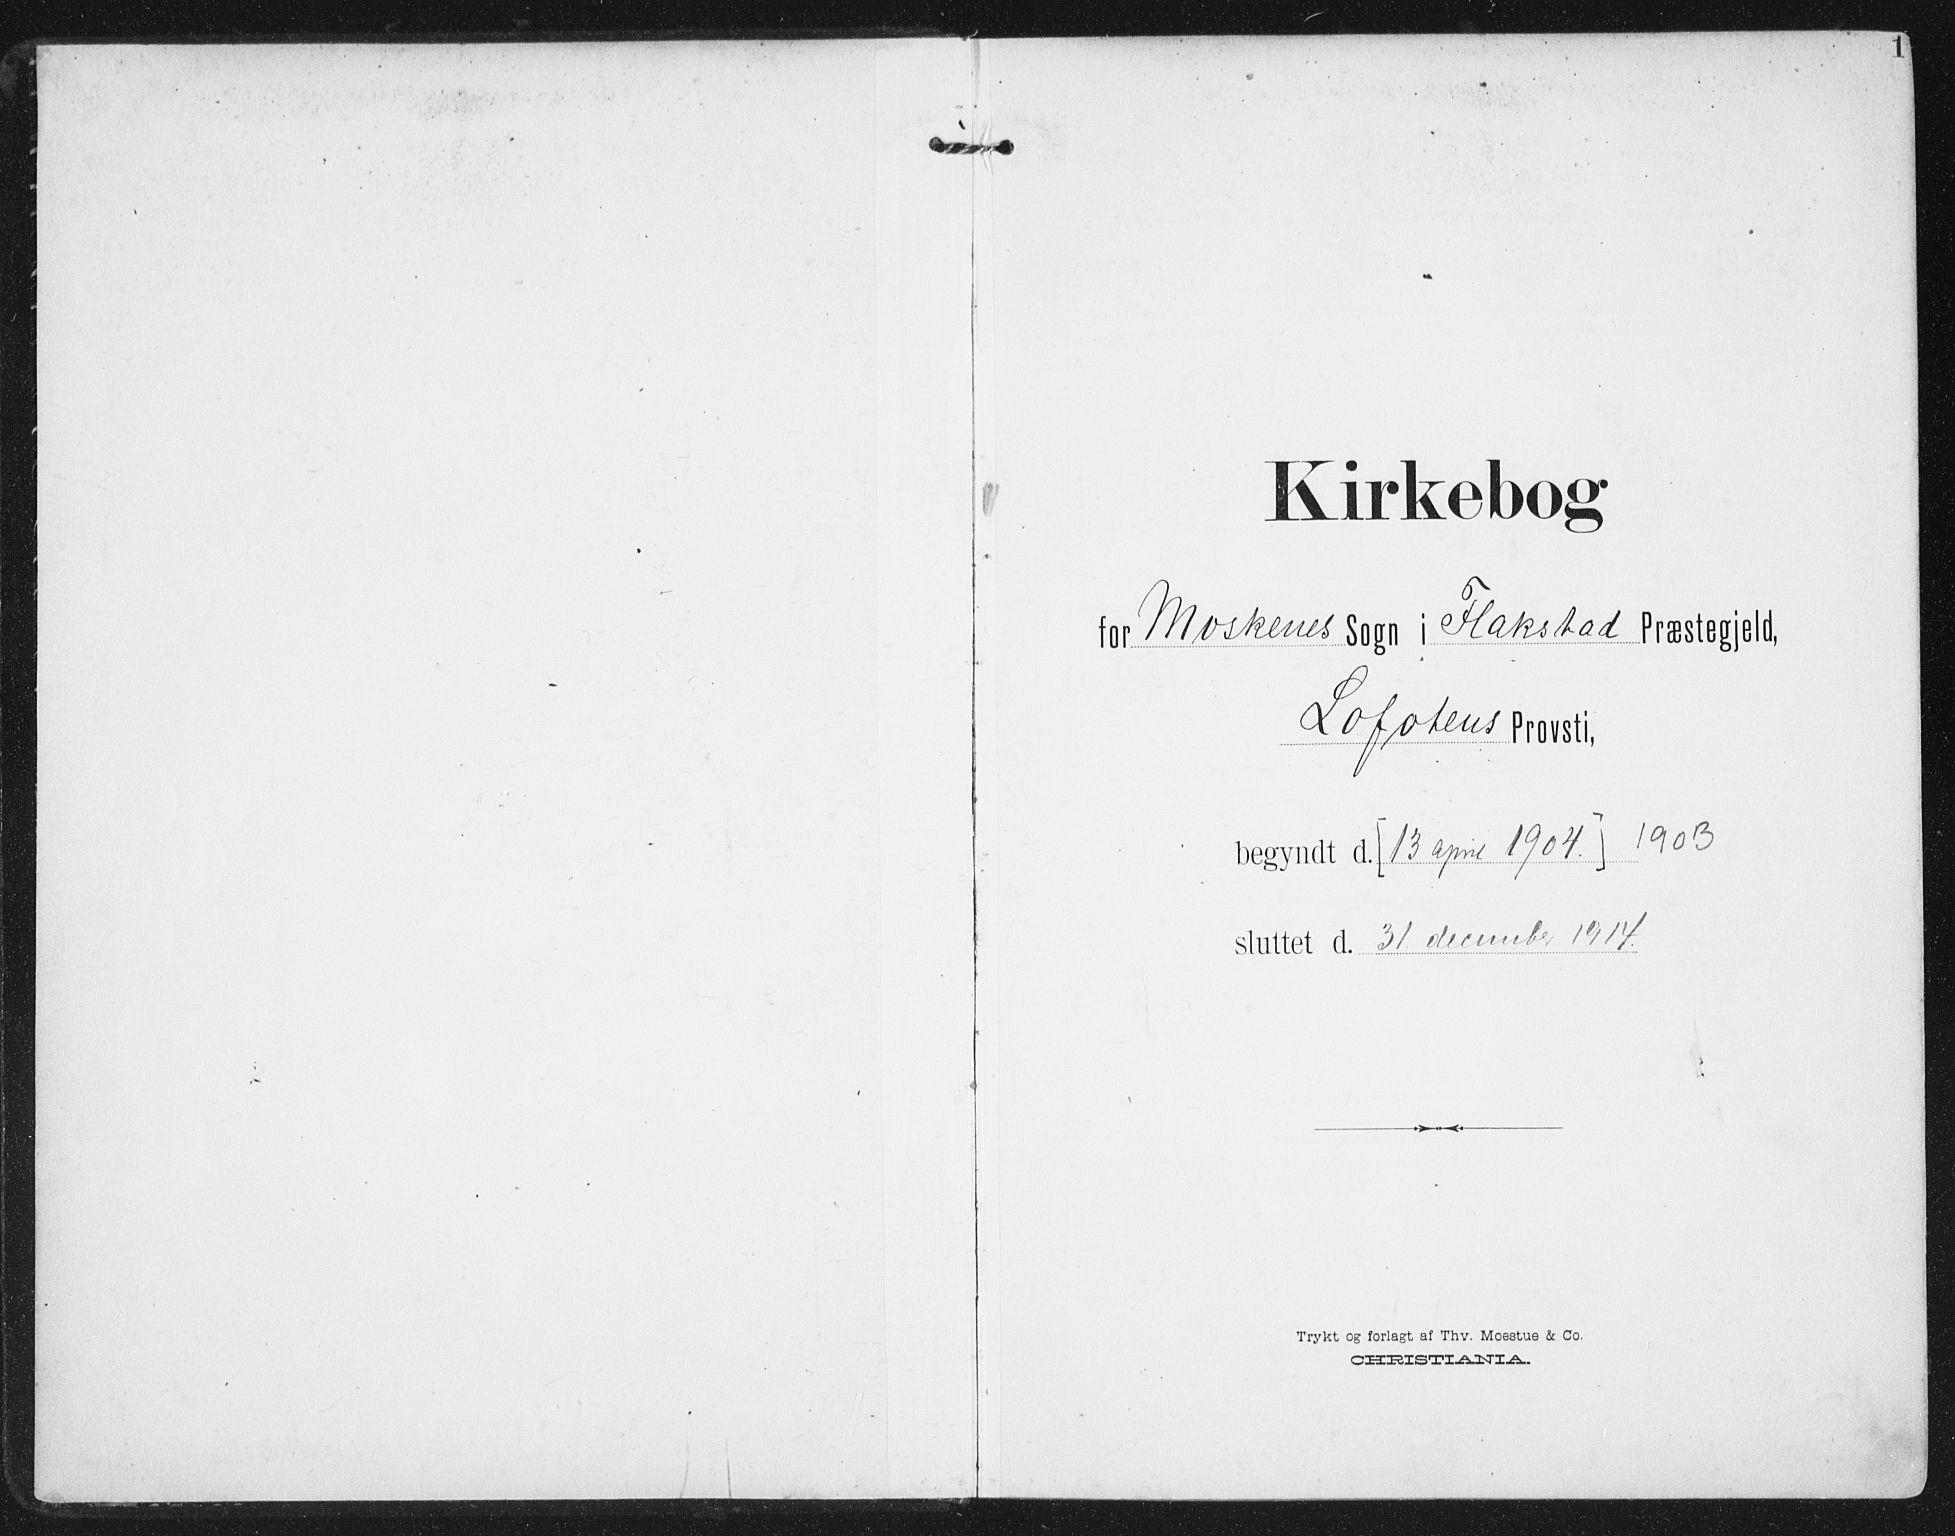 SAT, Ministerialprotokoller, klokkerbøker og fødselsregistre - Nordland, 886/L1221: Ministerialbok nr. 886A03, 1903-1913, s. 1